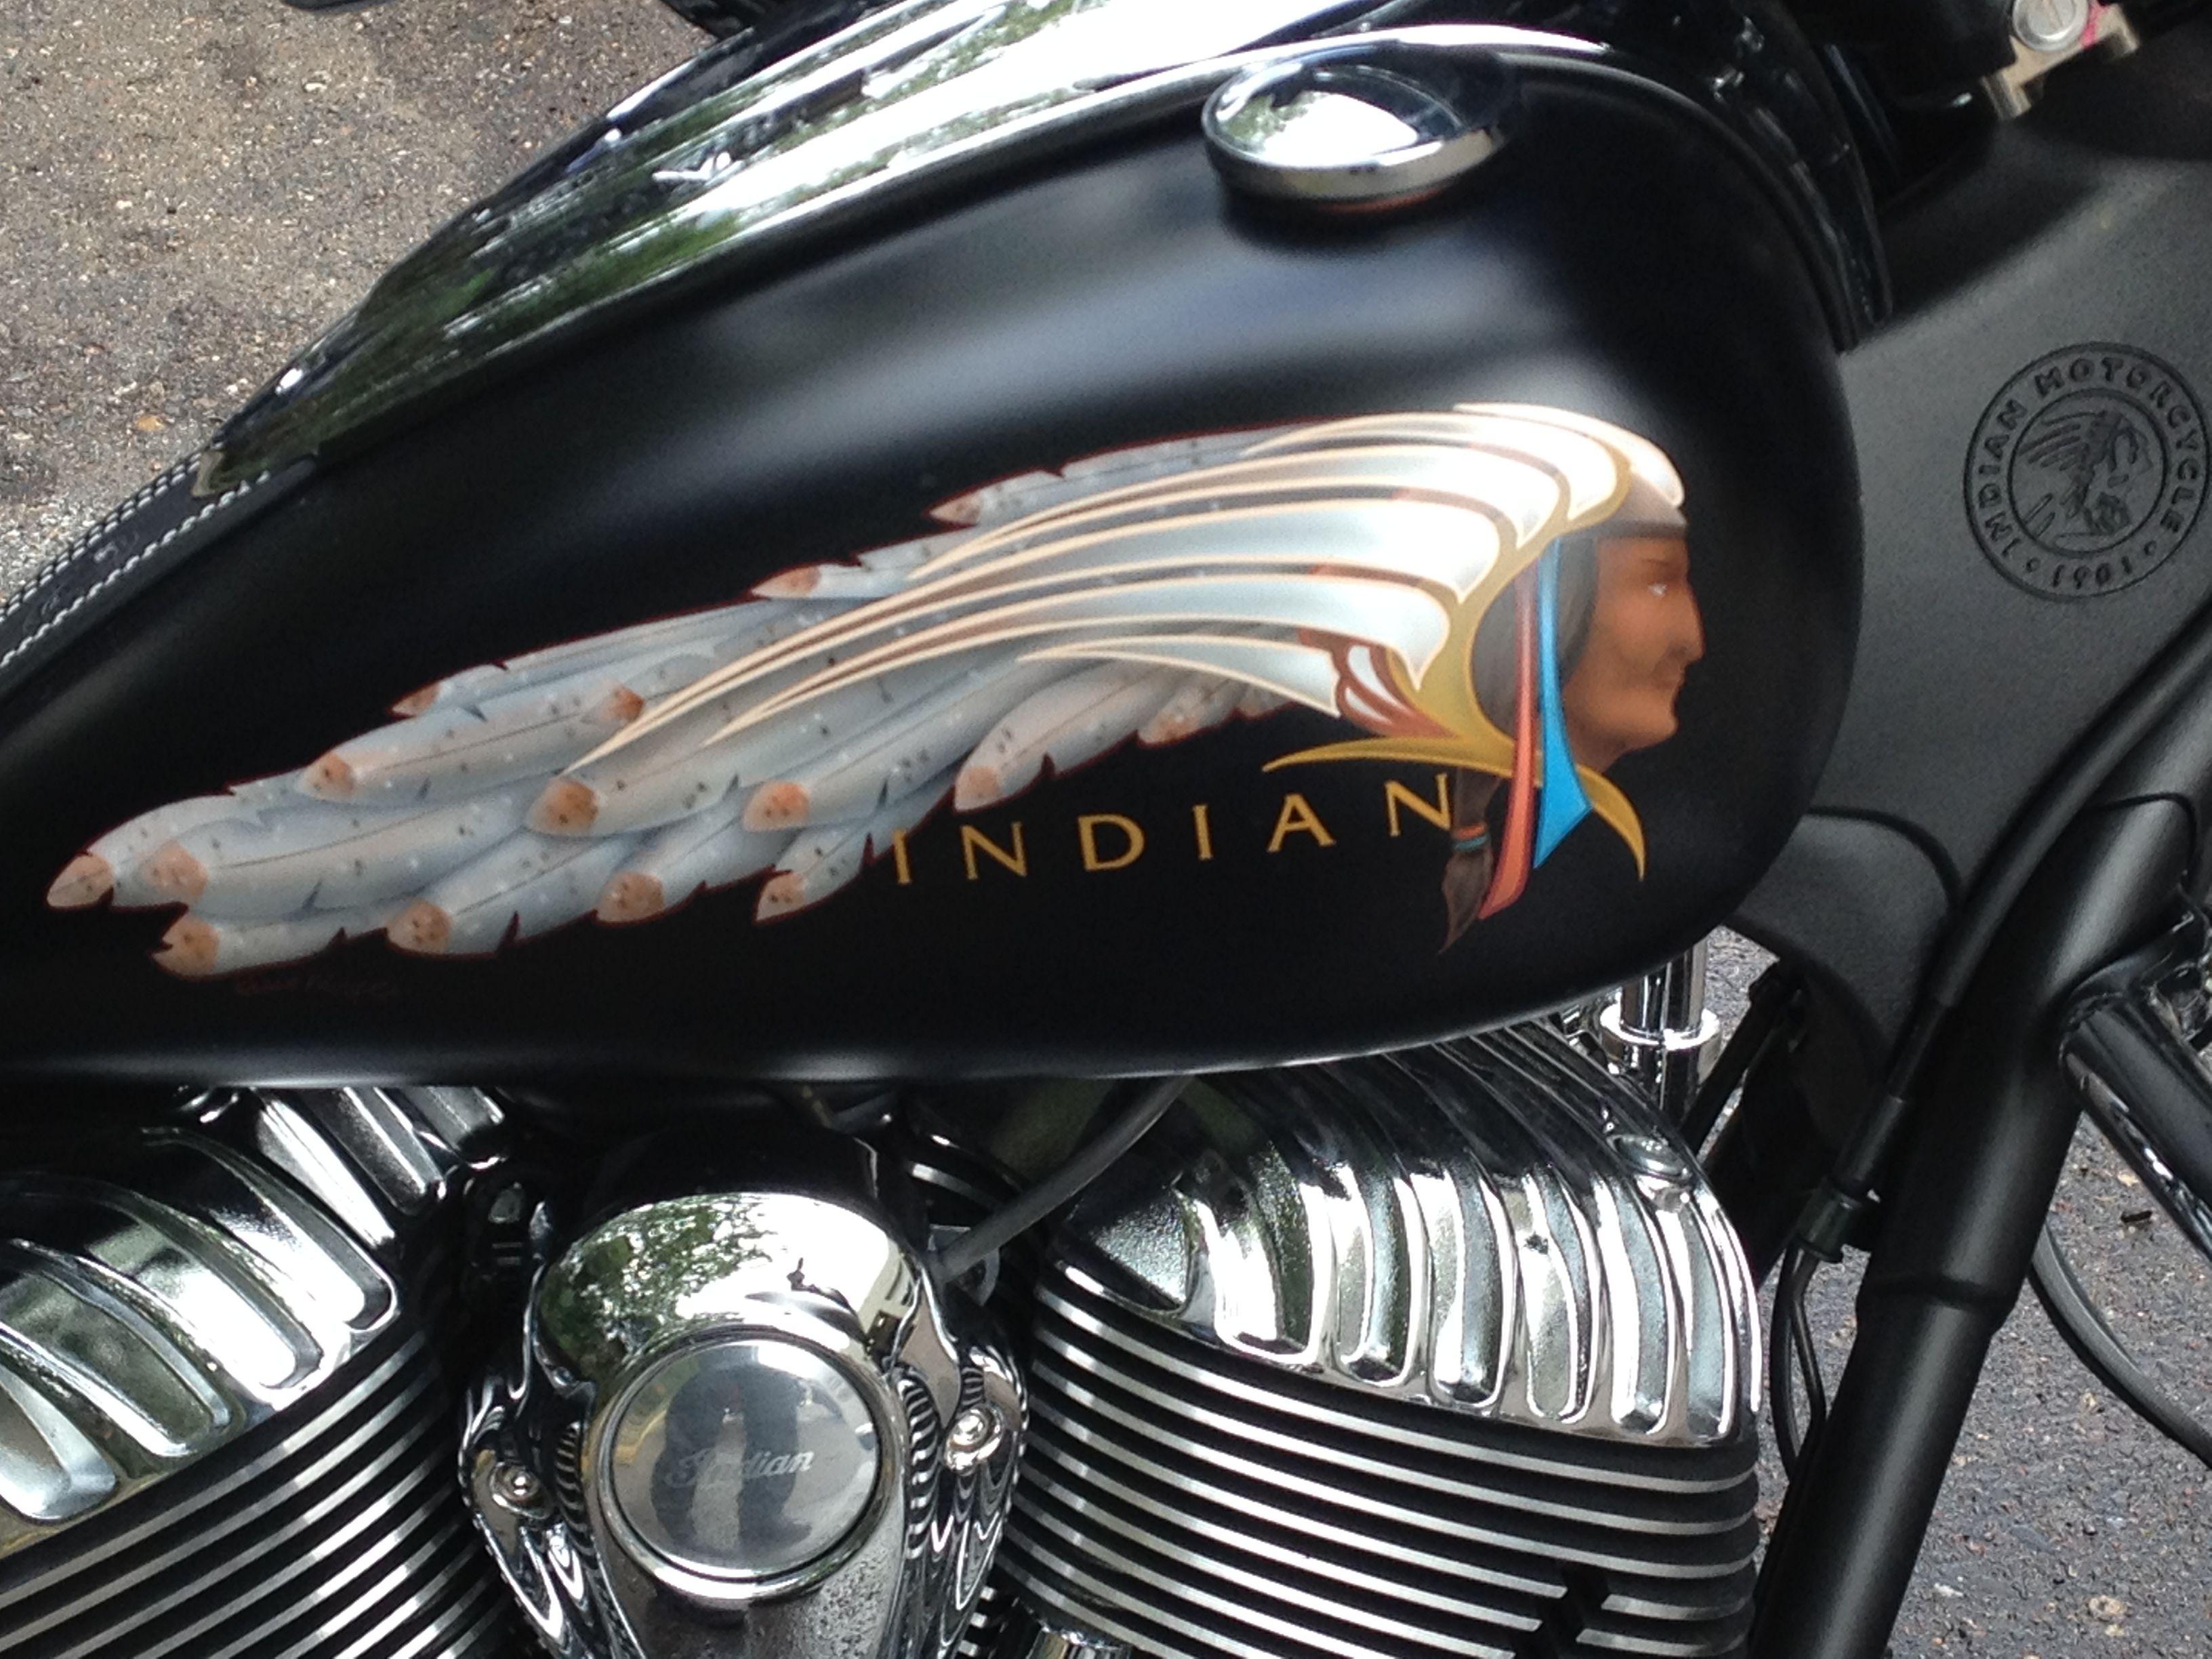 Indian Motorcycle Custom Painted Tank' Motorcycles